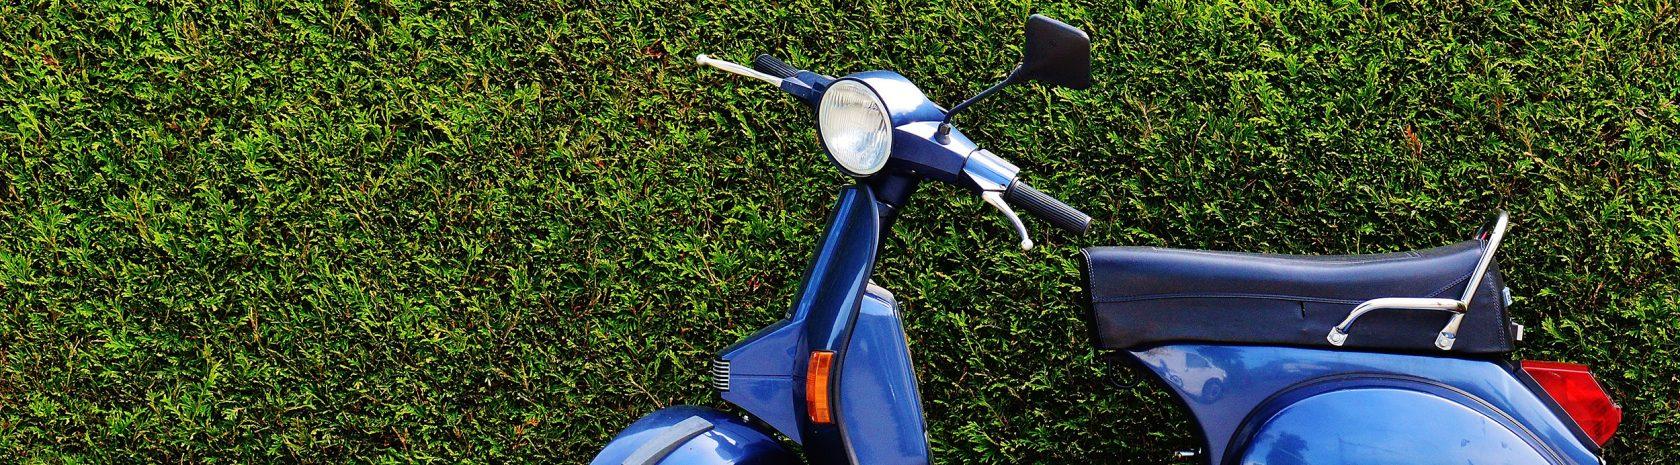 scooter gouda